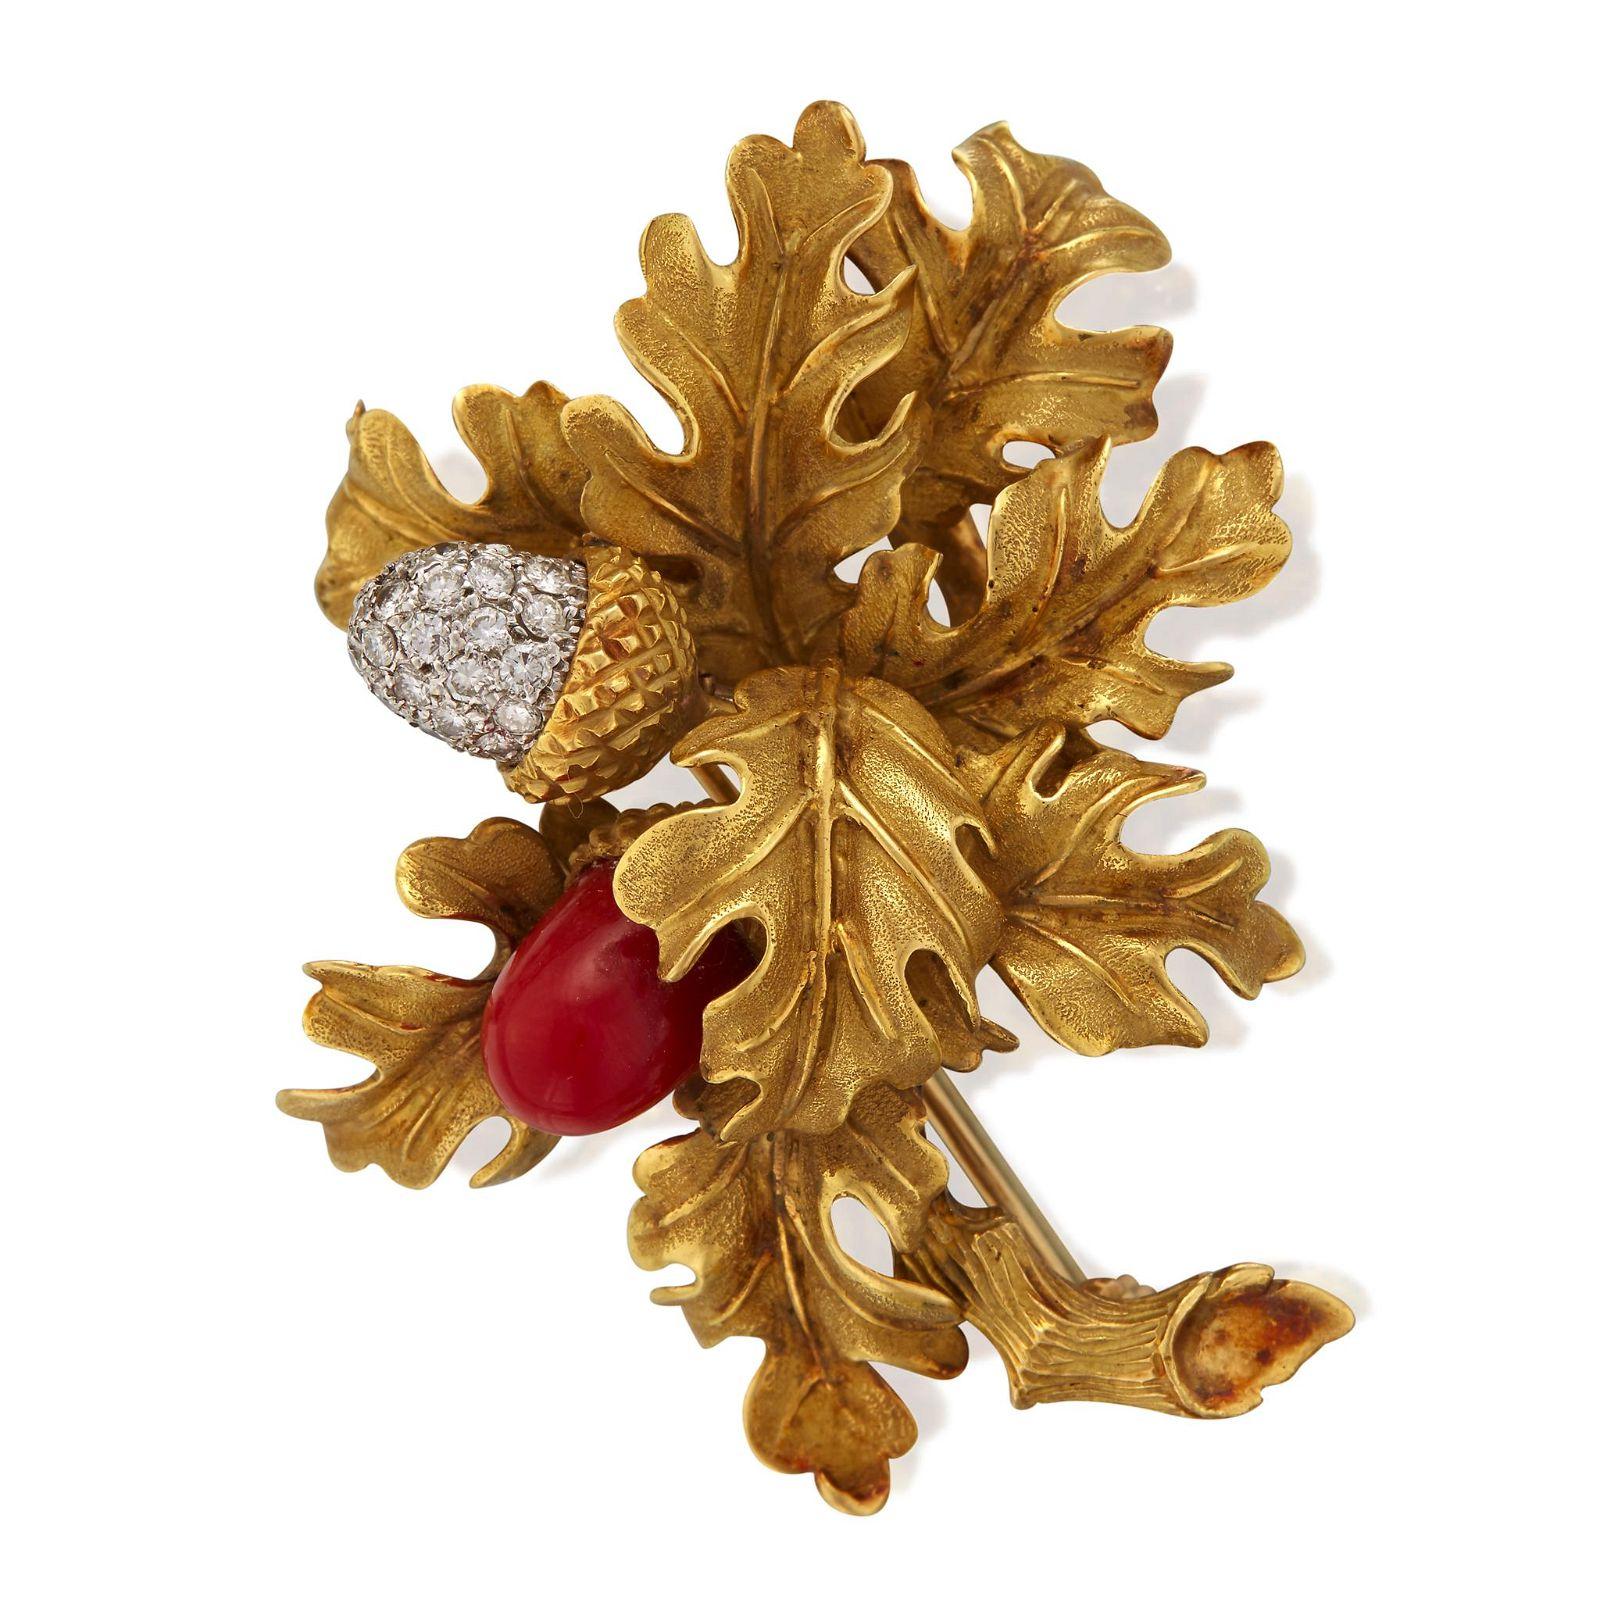 An eighteen karat gold, platinum, diamond, and coral